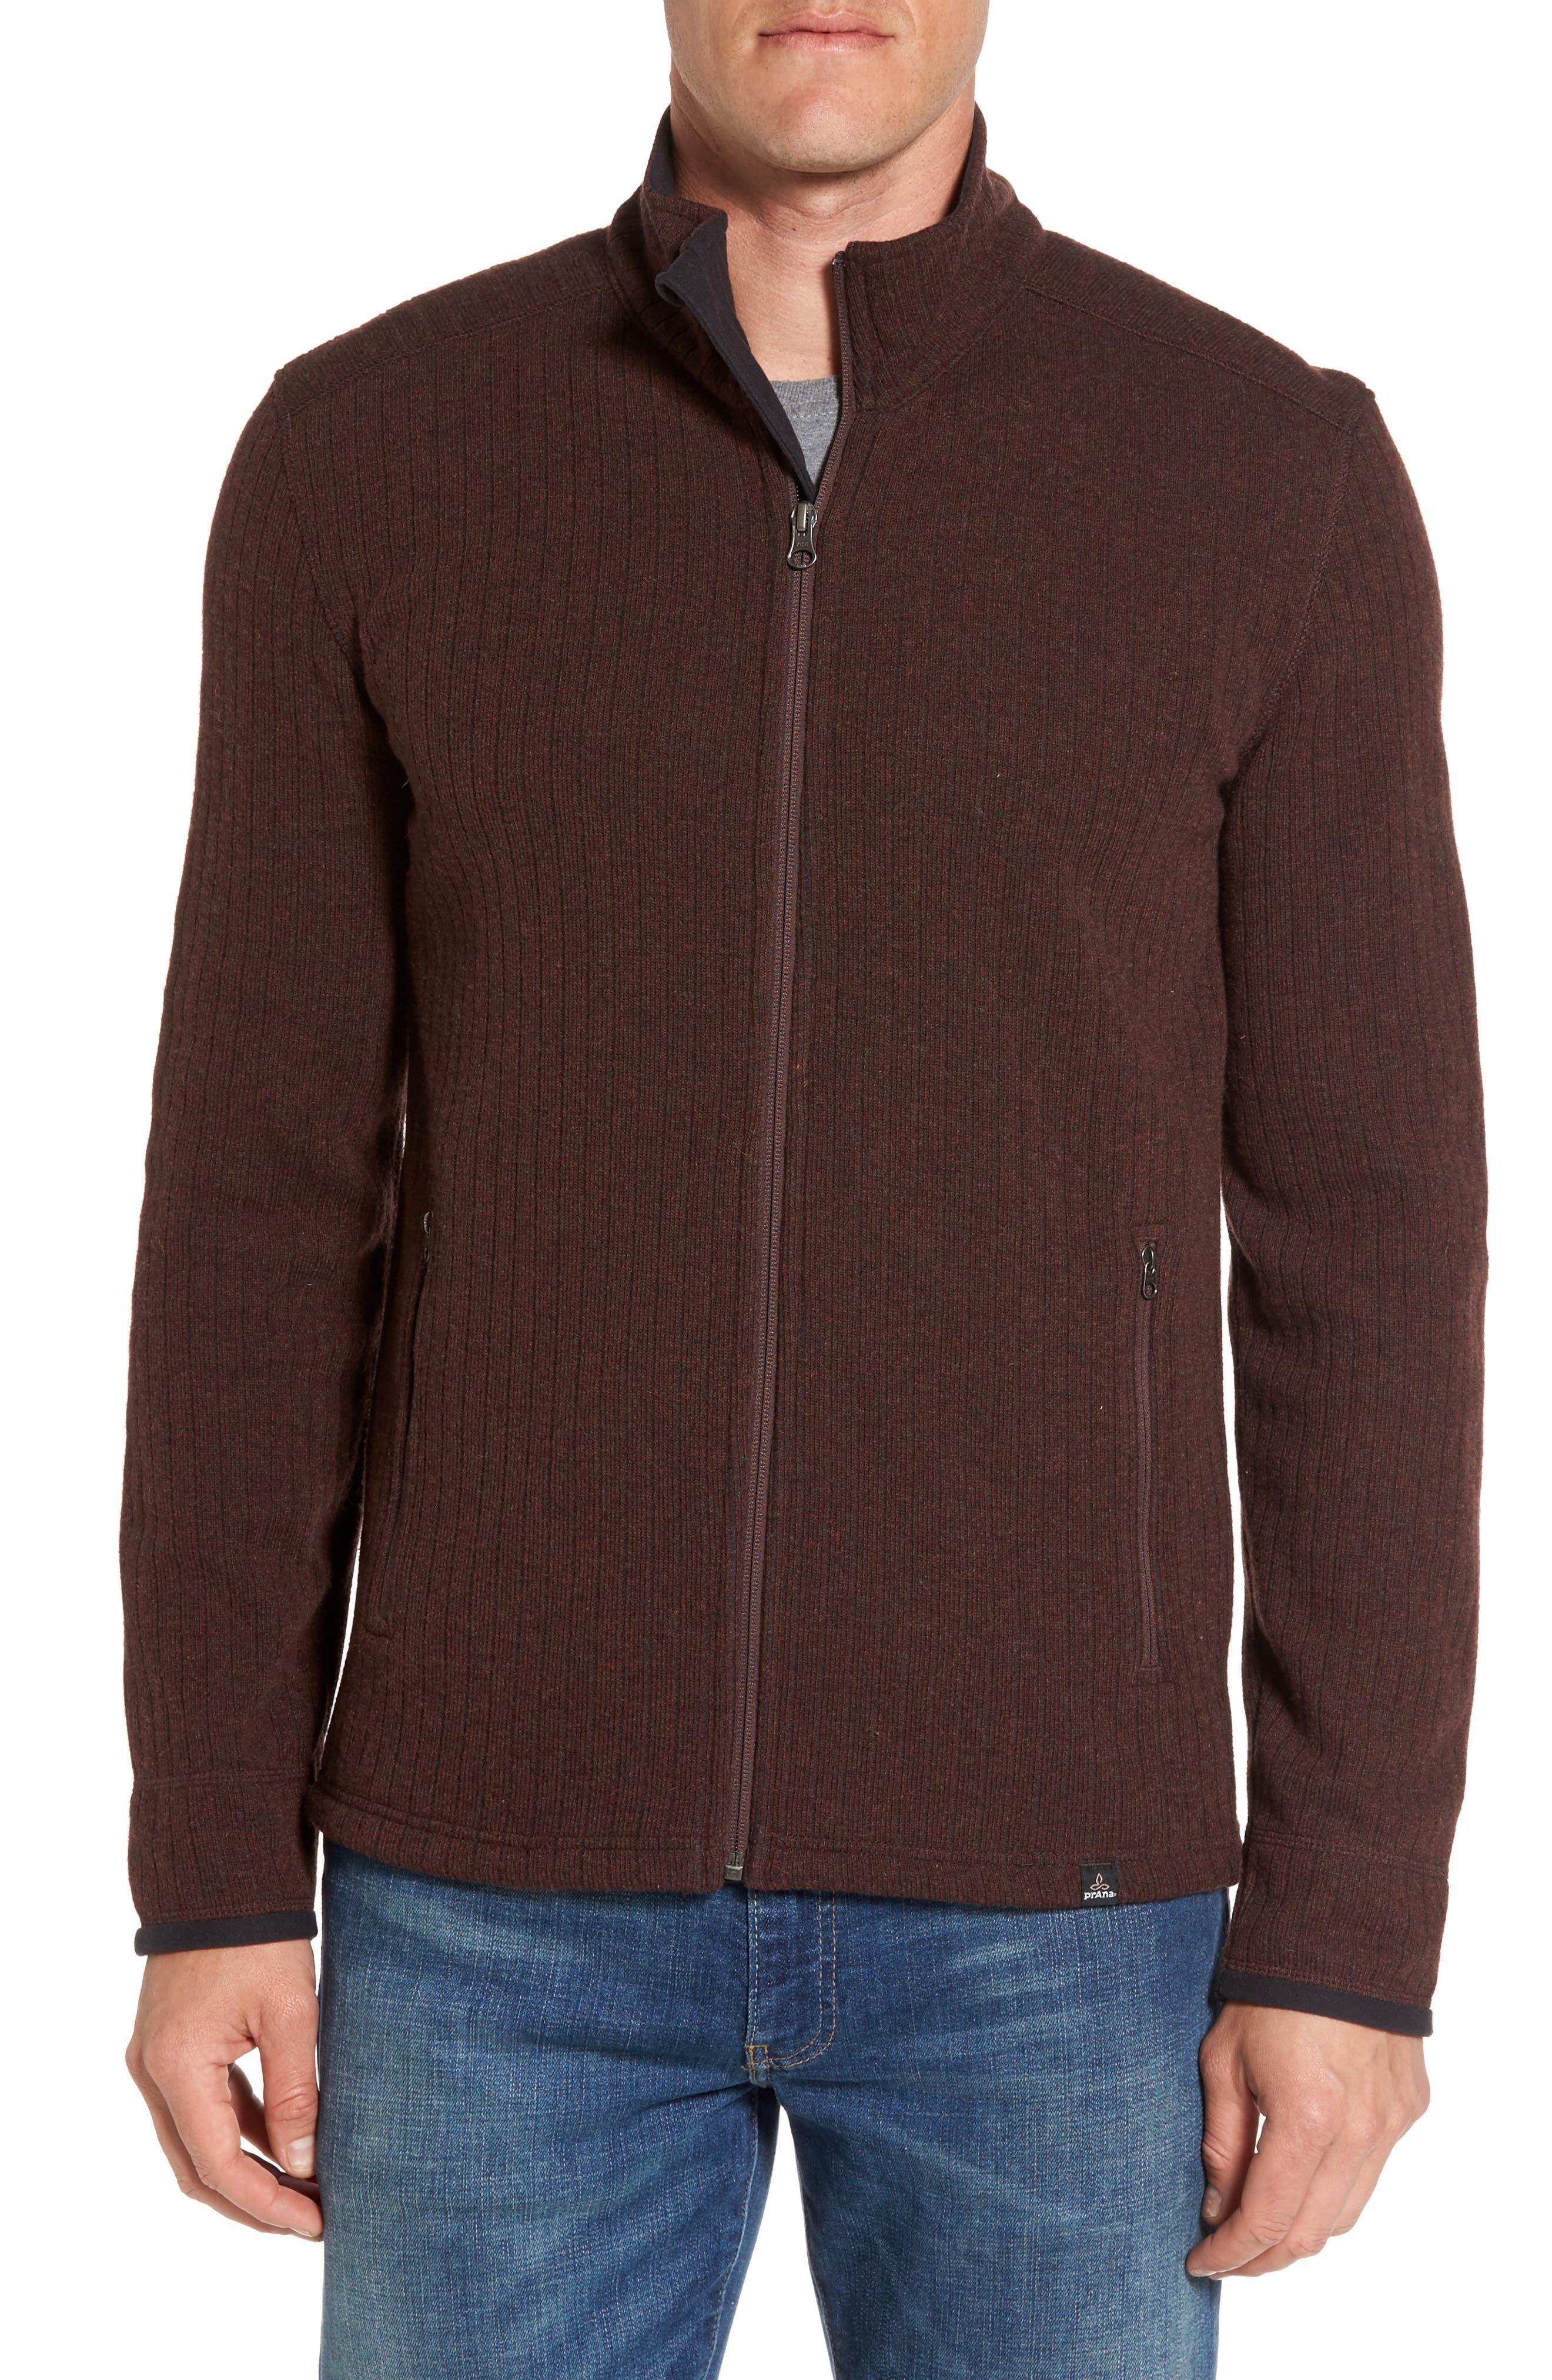 'Barclay' Full Zip Rib Knit Sweater,                         Main,                         color, Cocoa